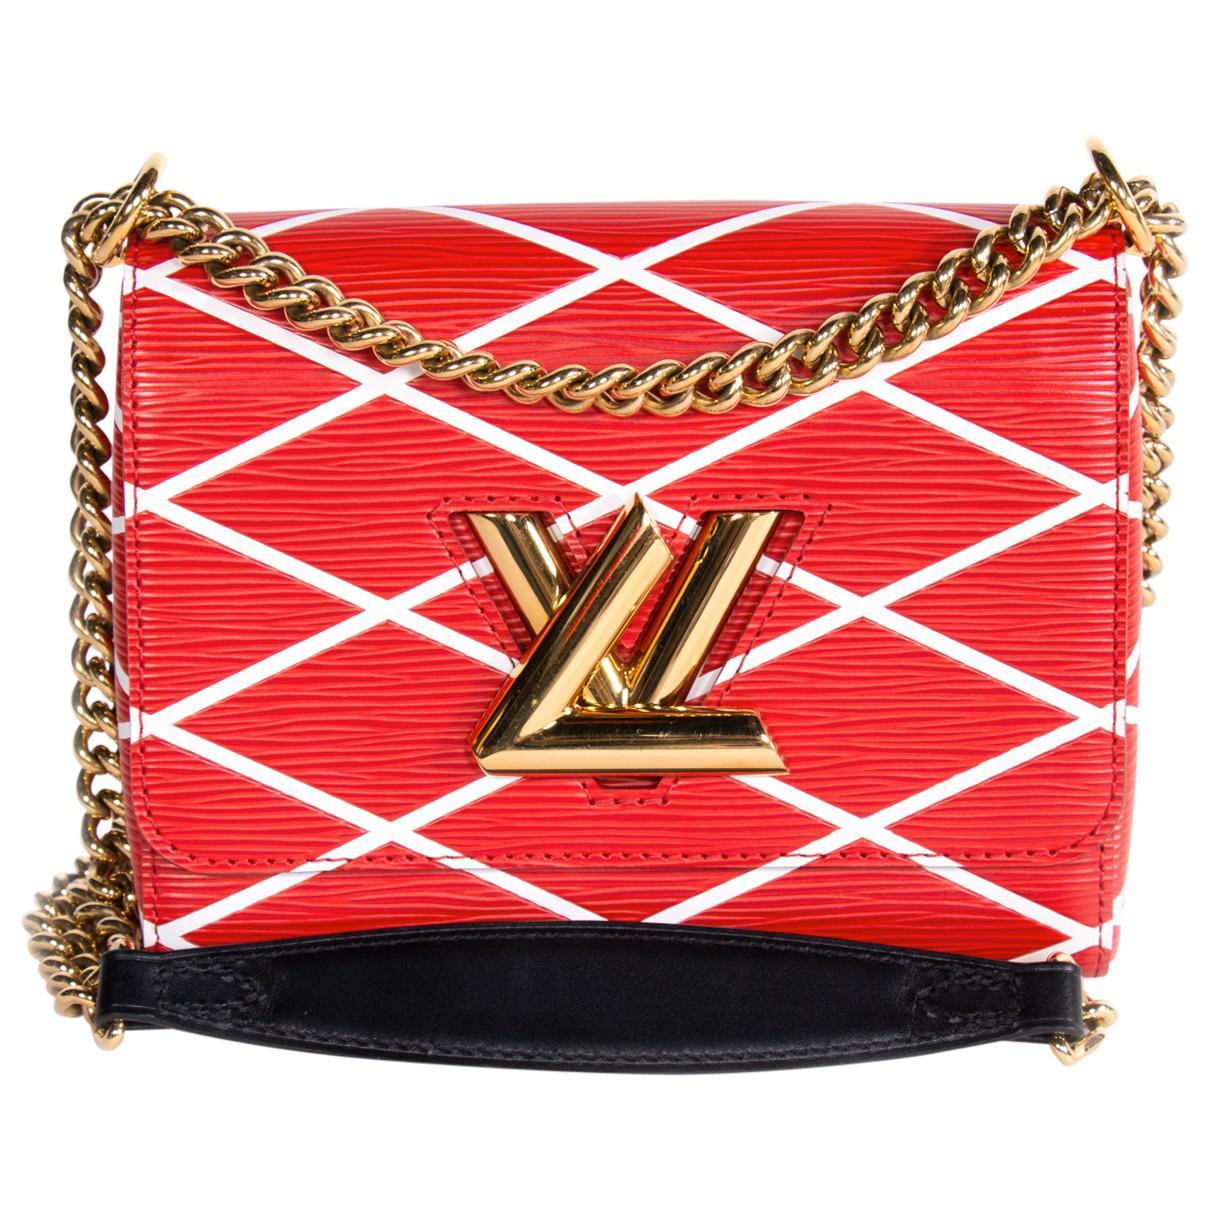 Pre-owned - Twist leather handbag Louis Vuitton ibz4KWj